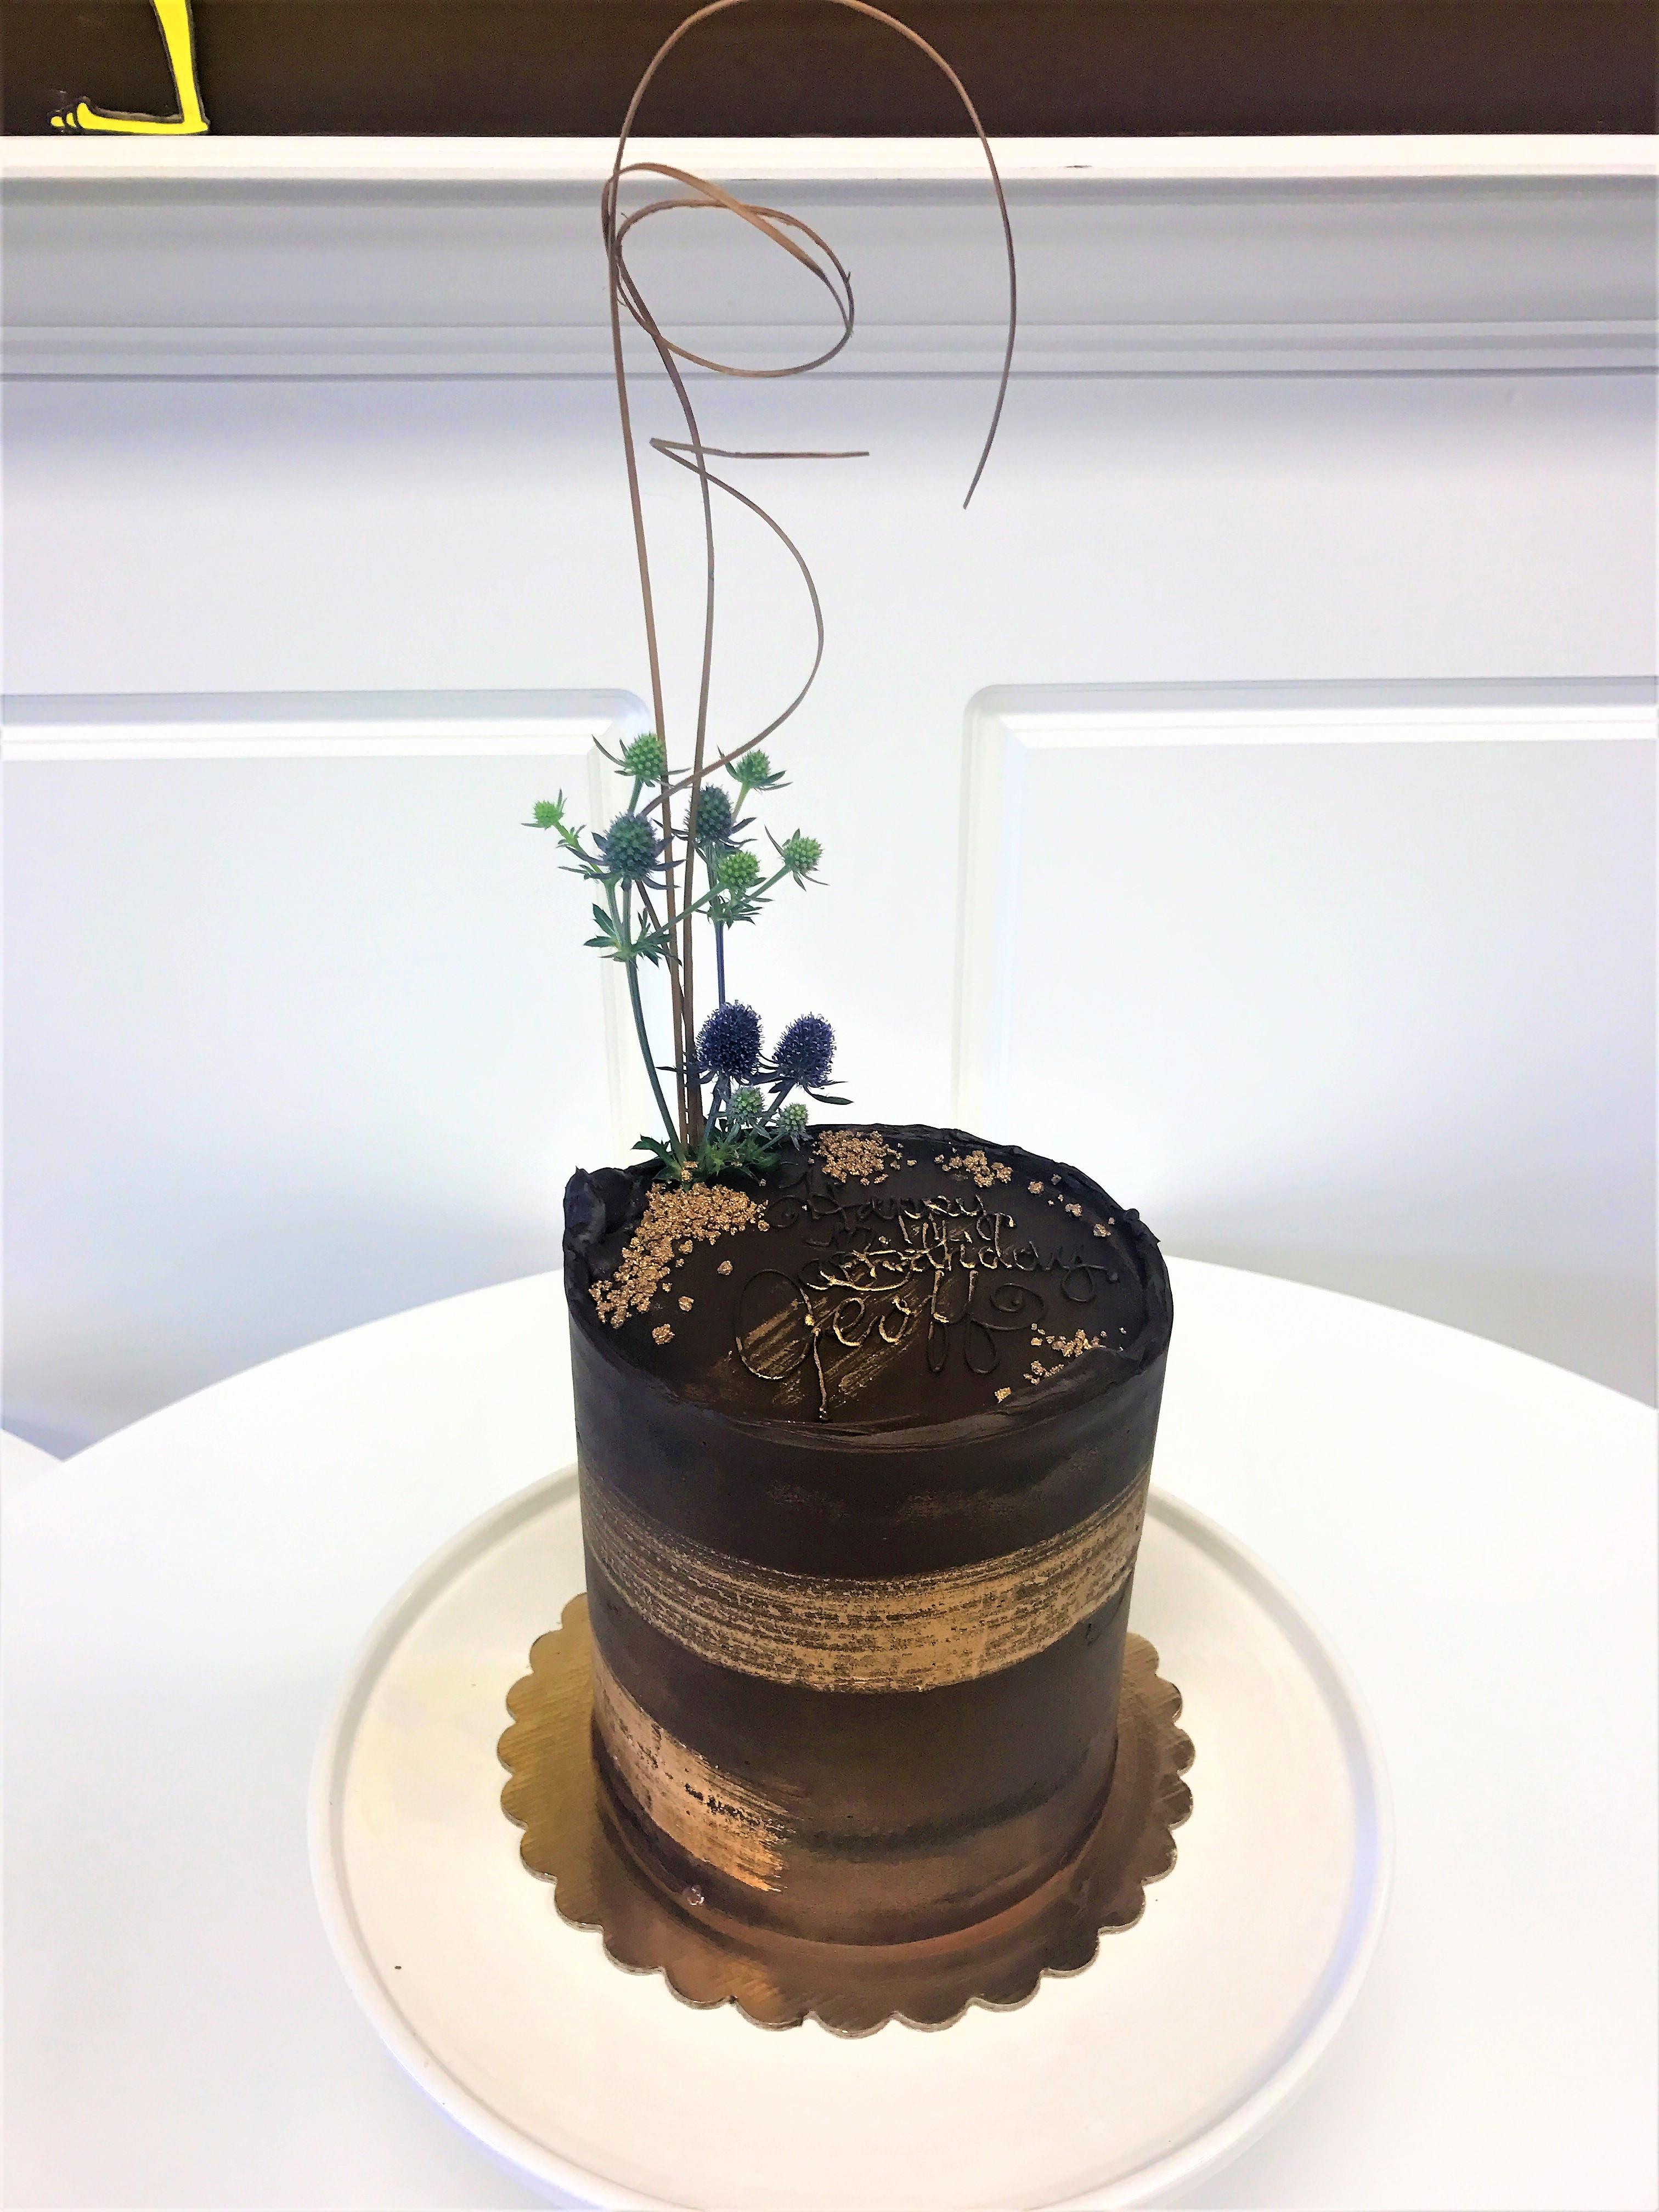 6'' chocolate coma cake